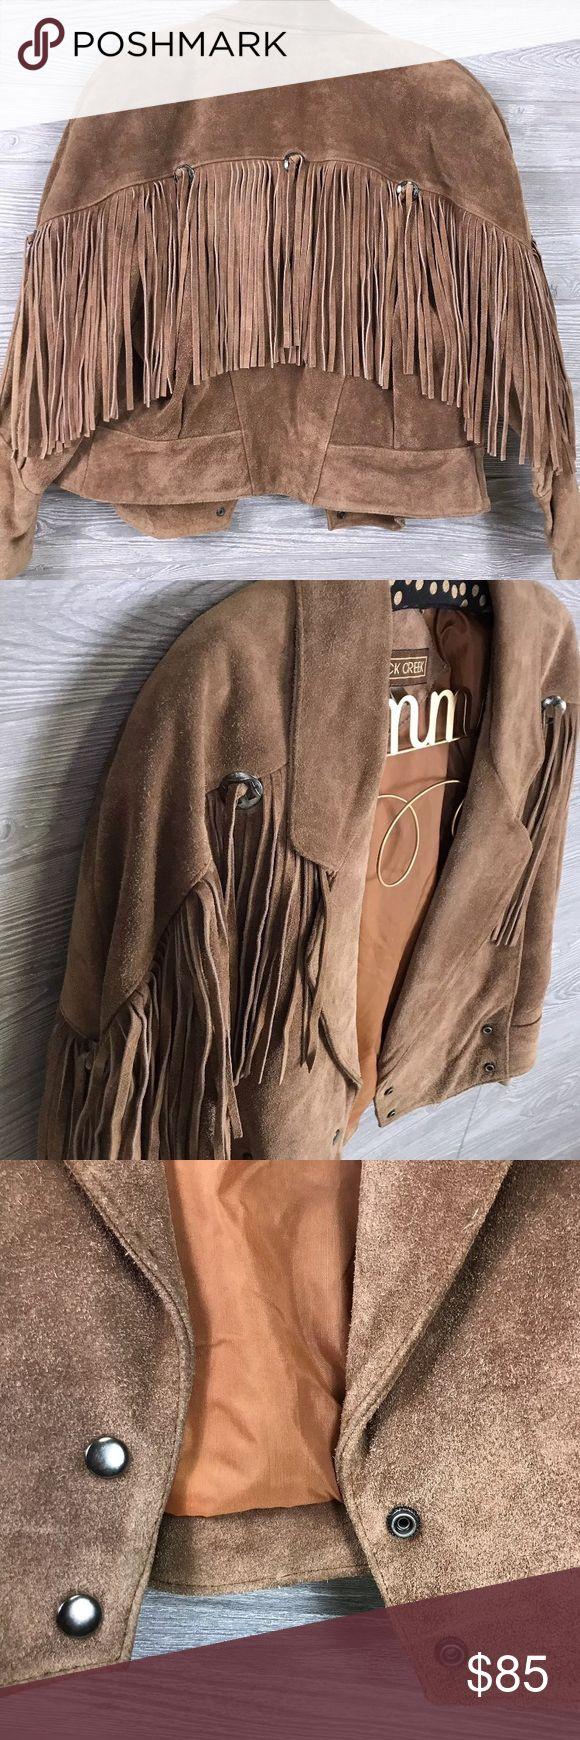 "Rock Creek Cowboy Western Fringe Leather Jacket 🌻Rock Creek Cowboy Western Fringed Leather Jacket Size Medium  Measurements all taken laying flat: armpit to armpit - 21"" sleeve length - 28"" length - 24"" Rock Creek Jackets & Coats"